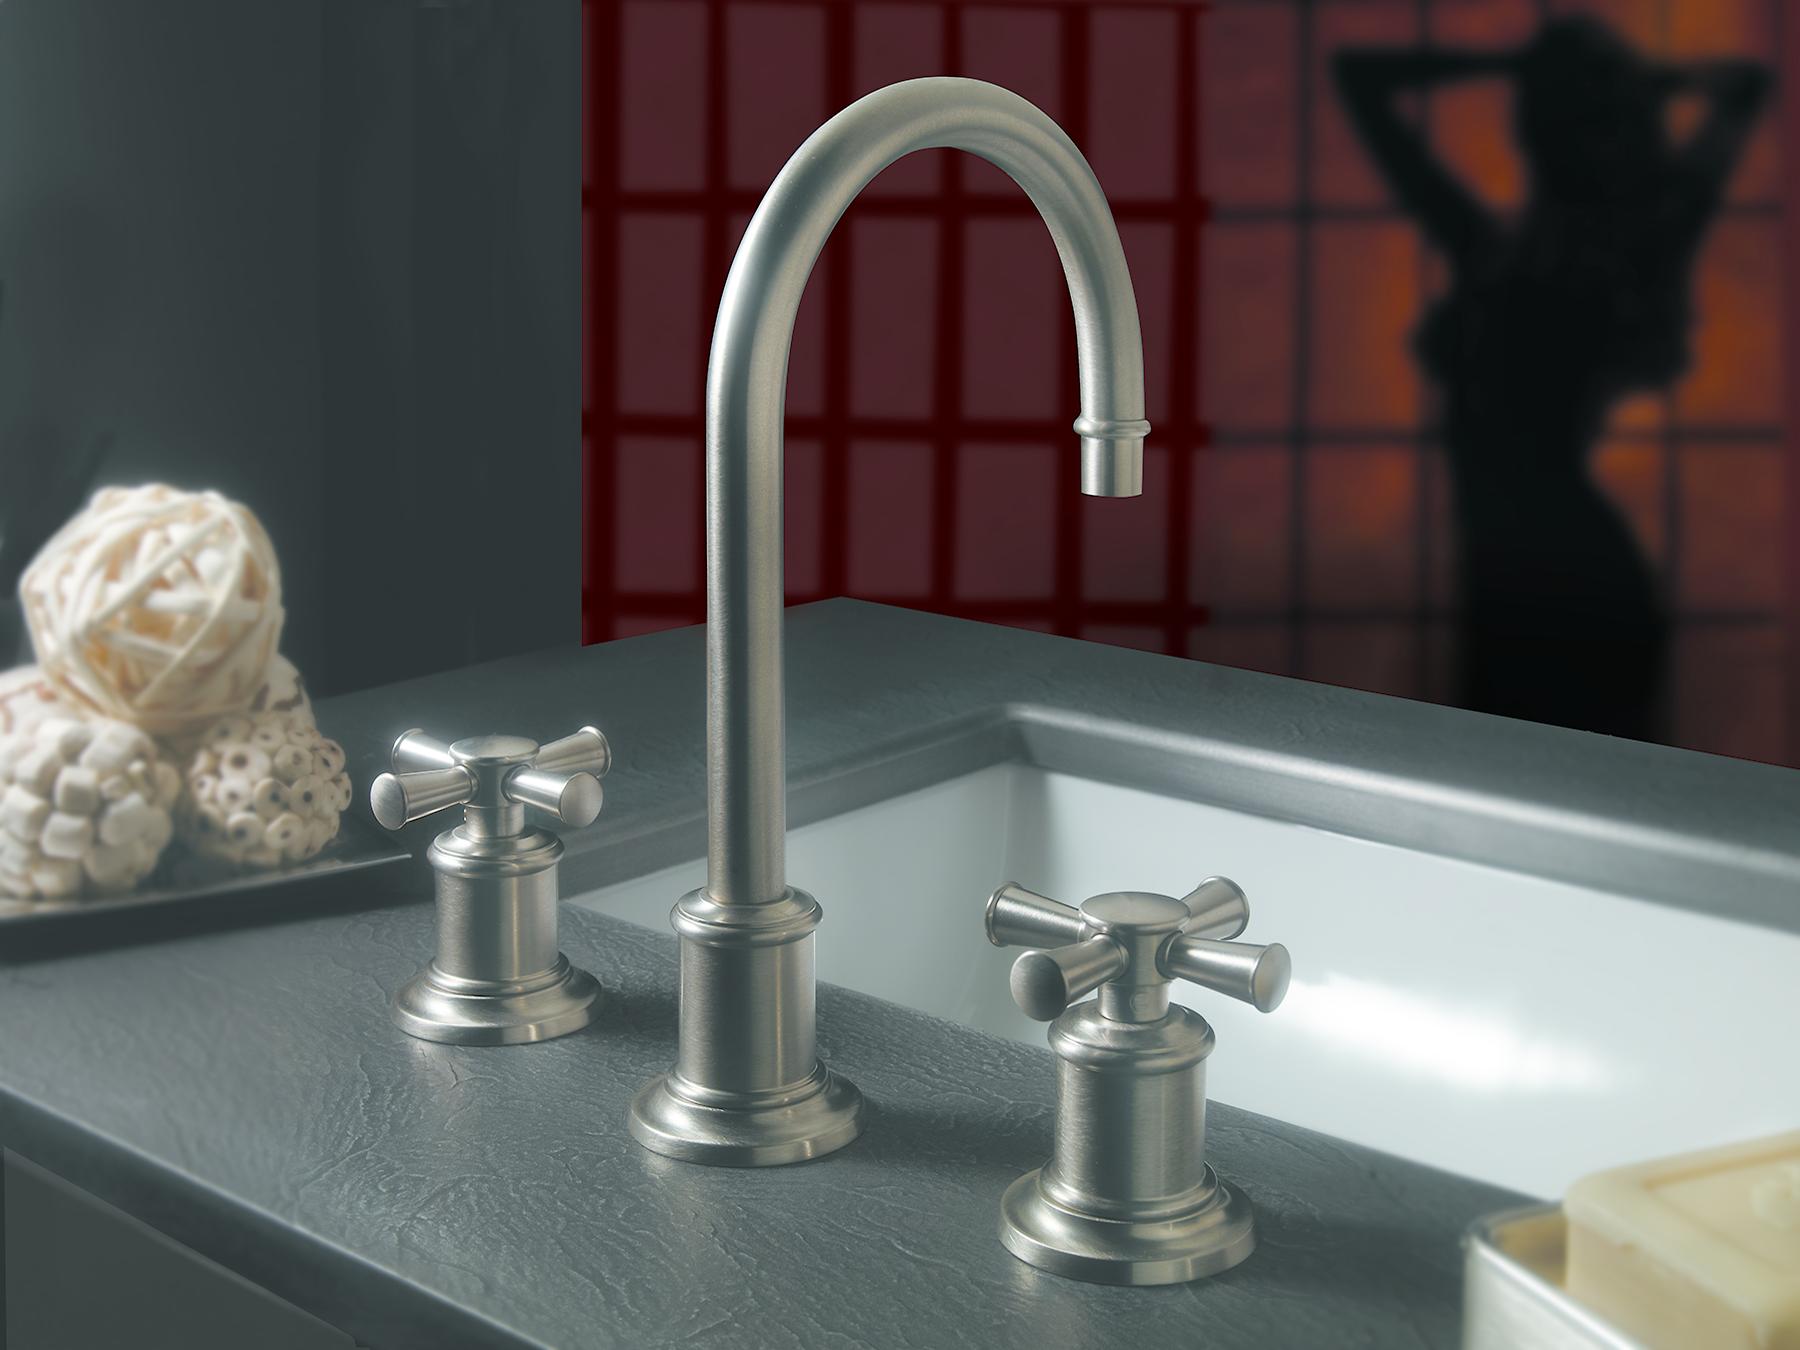 Miramar bath faucet for residential pros for Miramar kitchen and bath